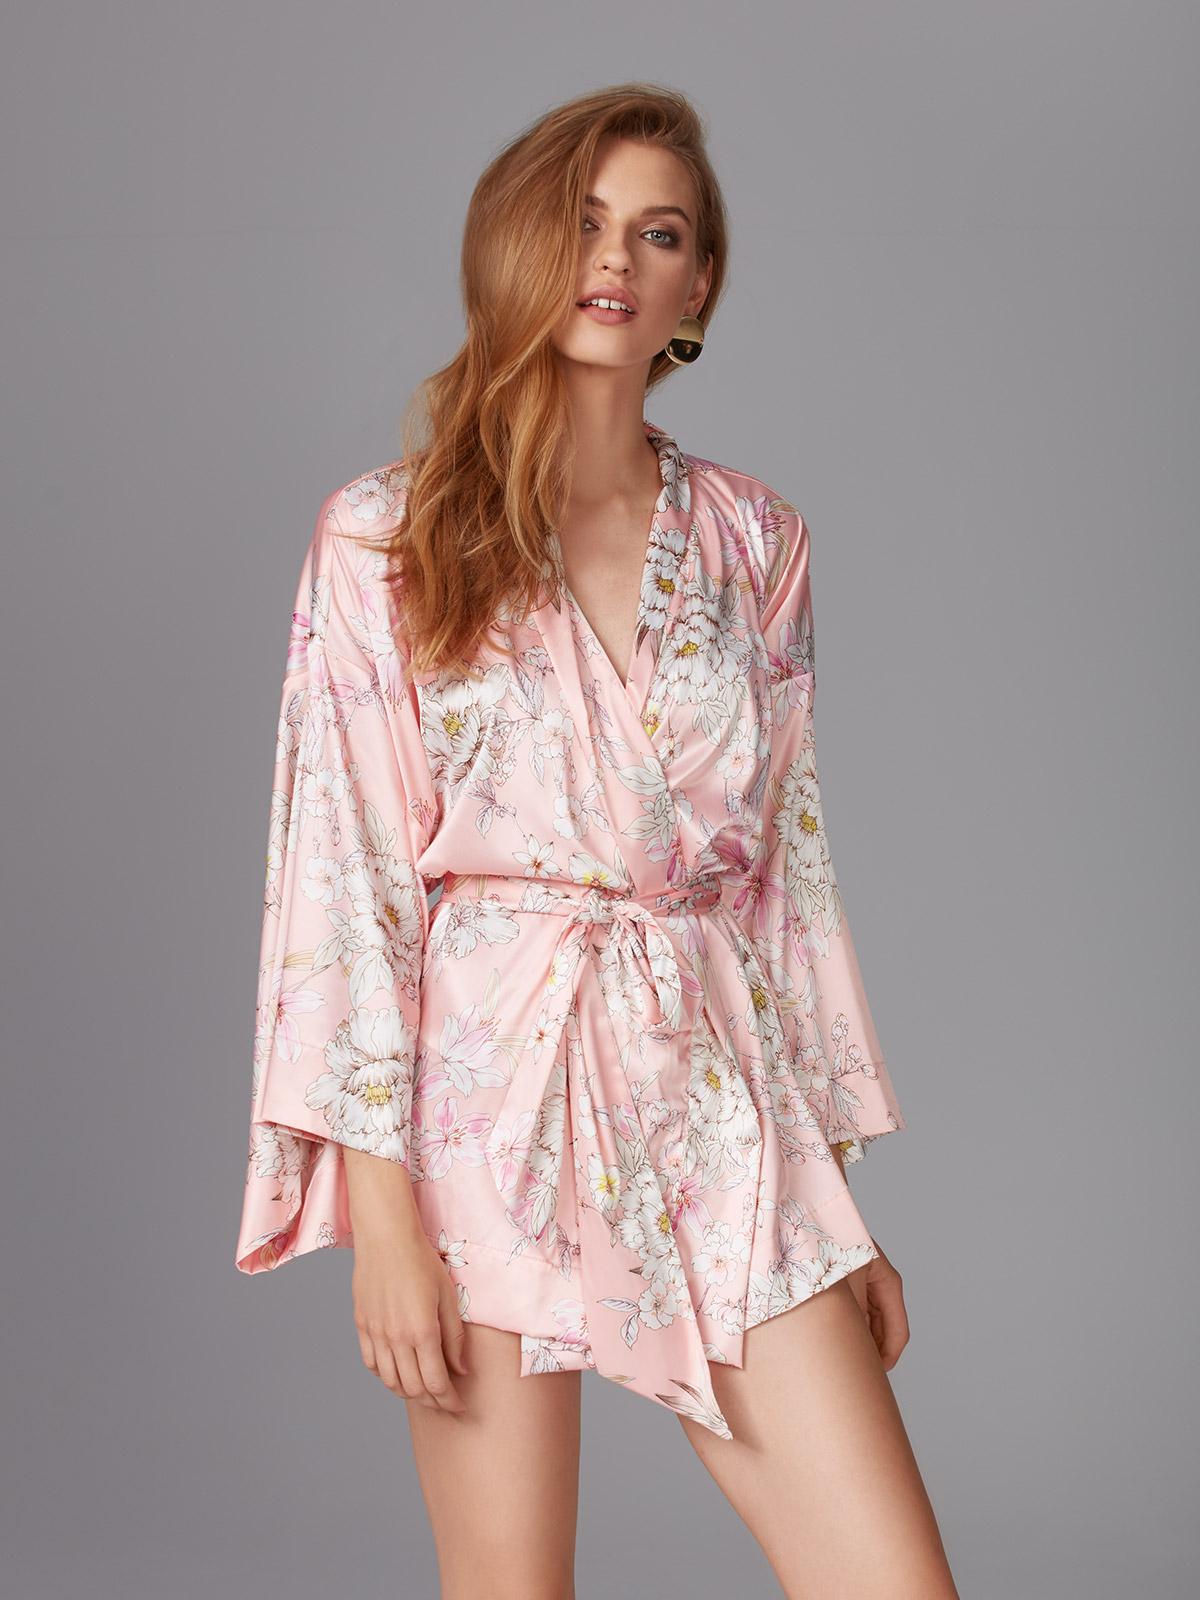 Good Mood OZ076 Kimono Stampa<br />04 Pink, 13 Blue